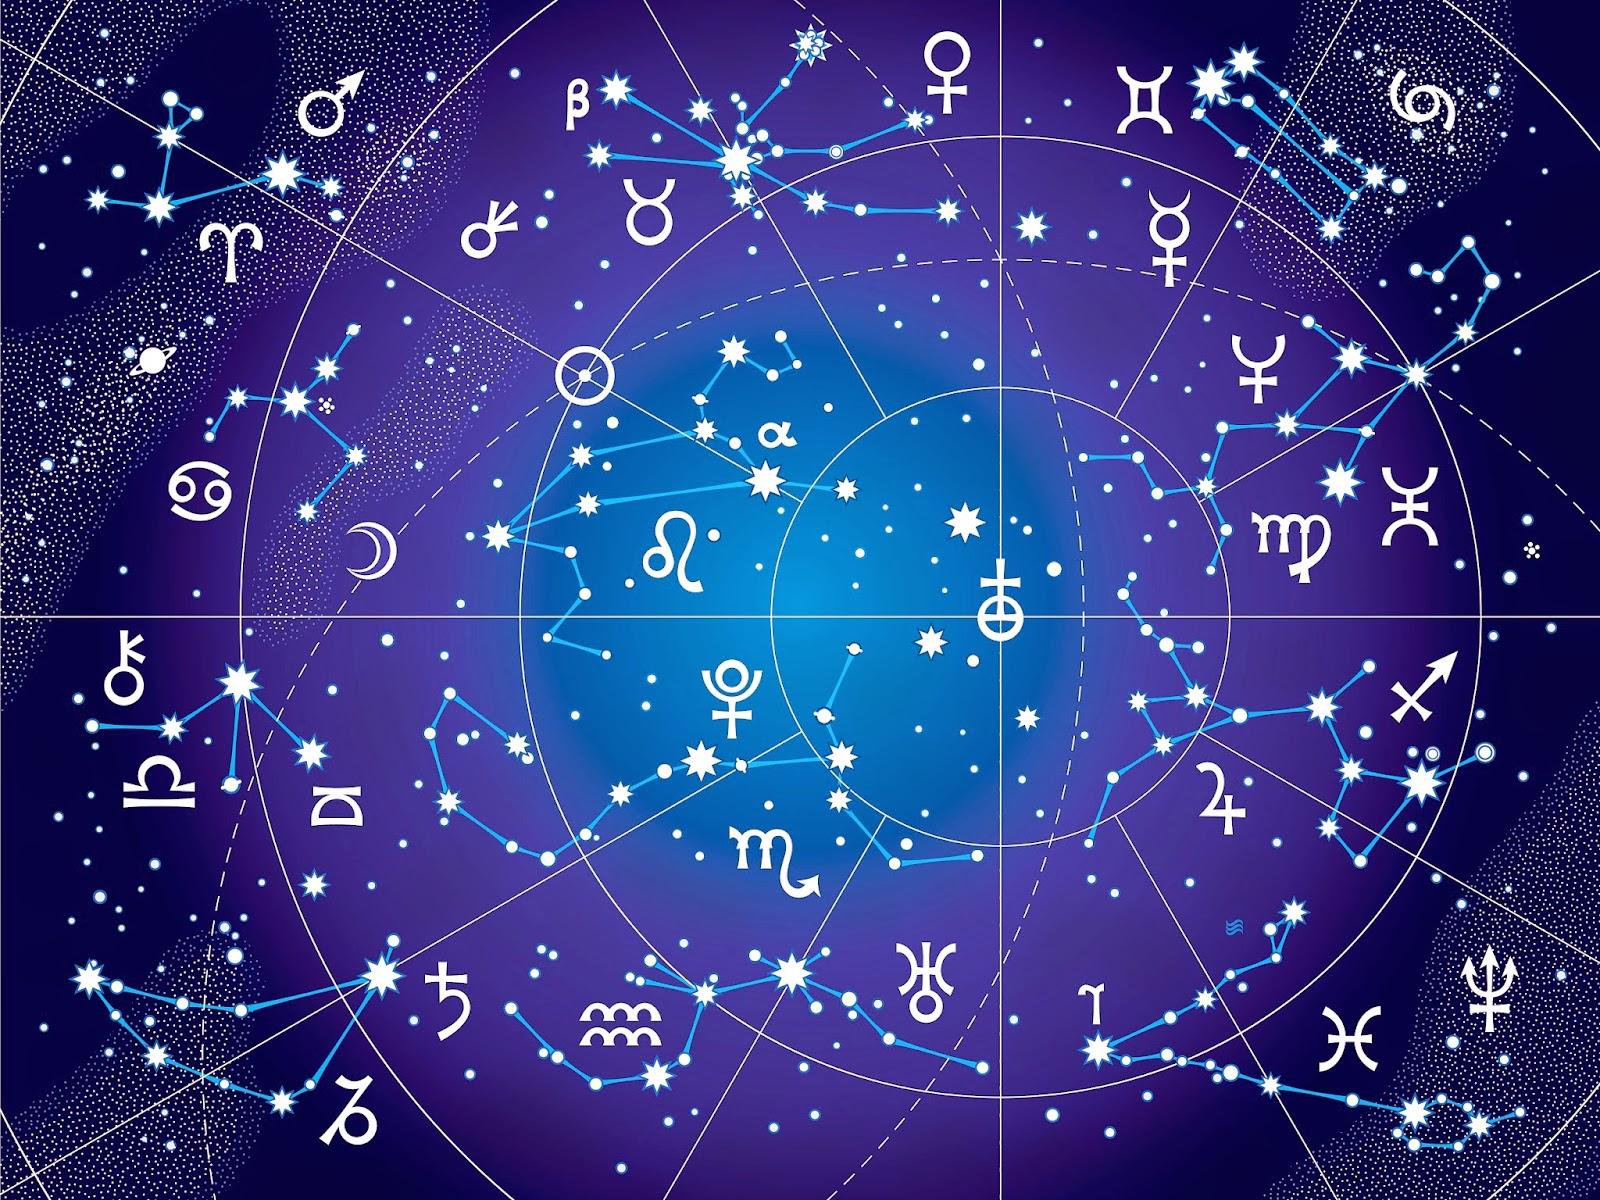 nadi system of human